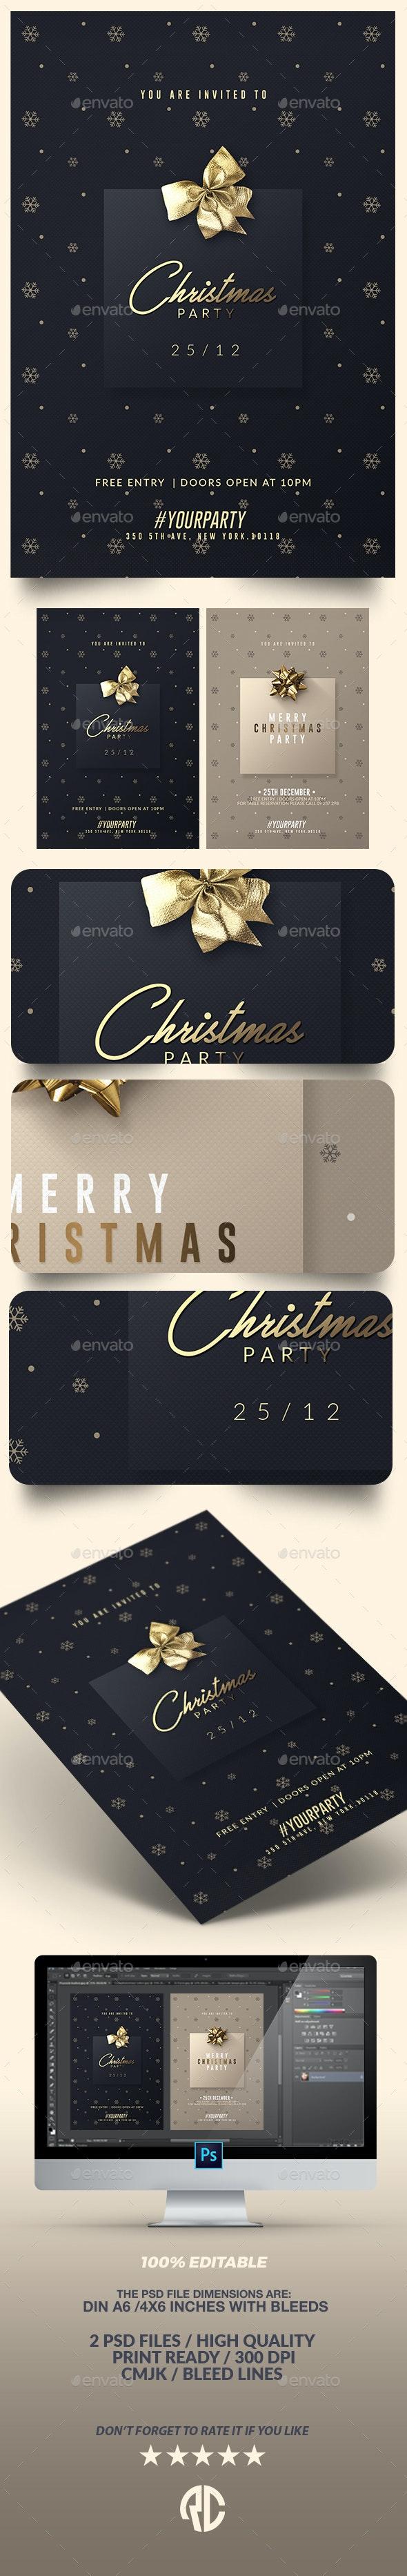 2 Classy Christmas Party   Invitation Templates - Cards & Invites Print Templates